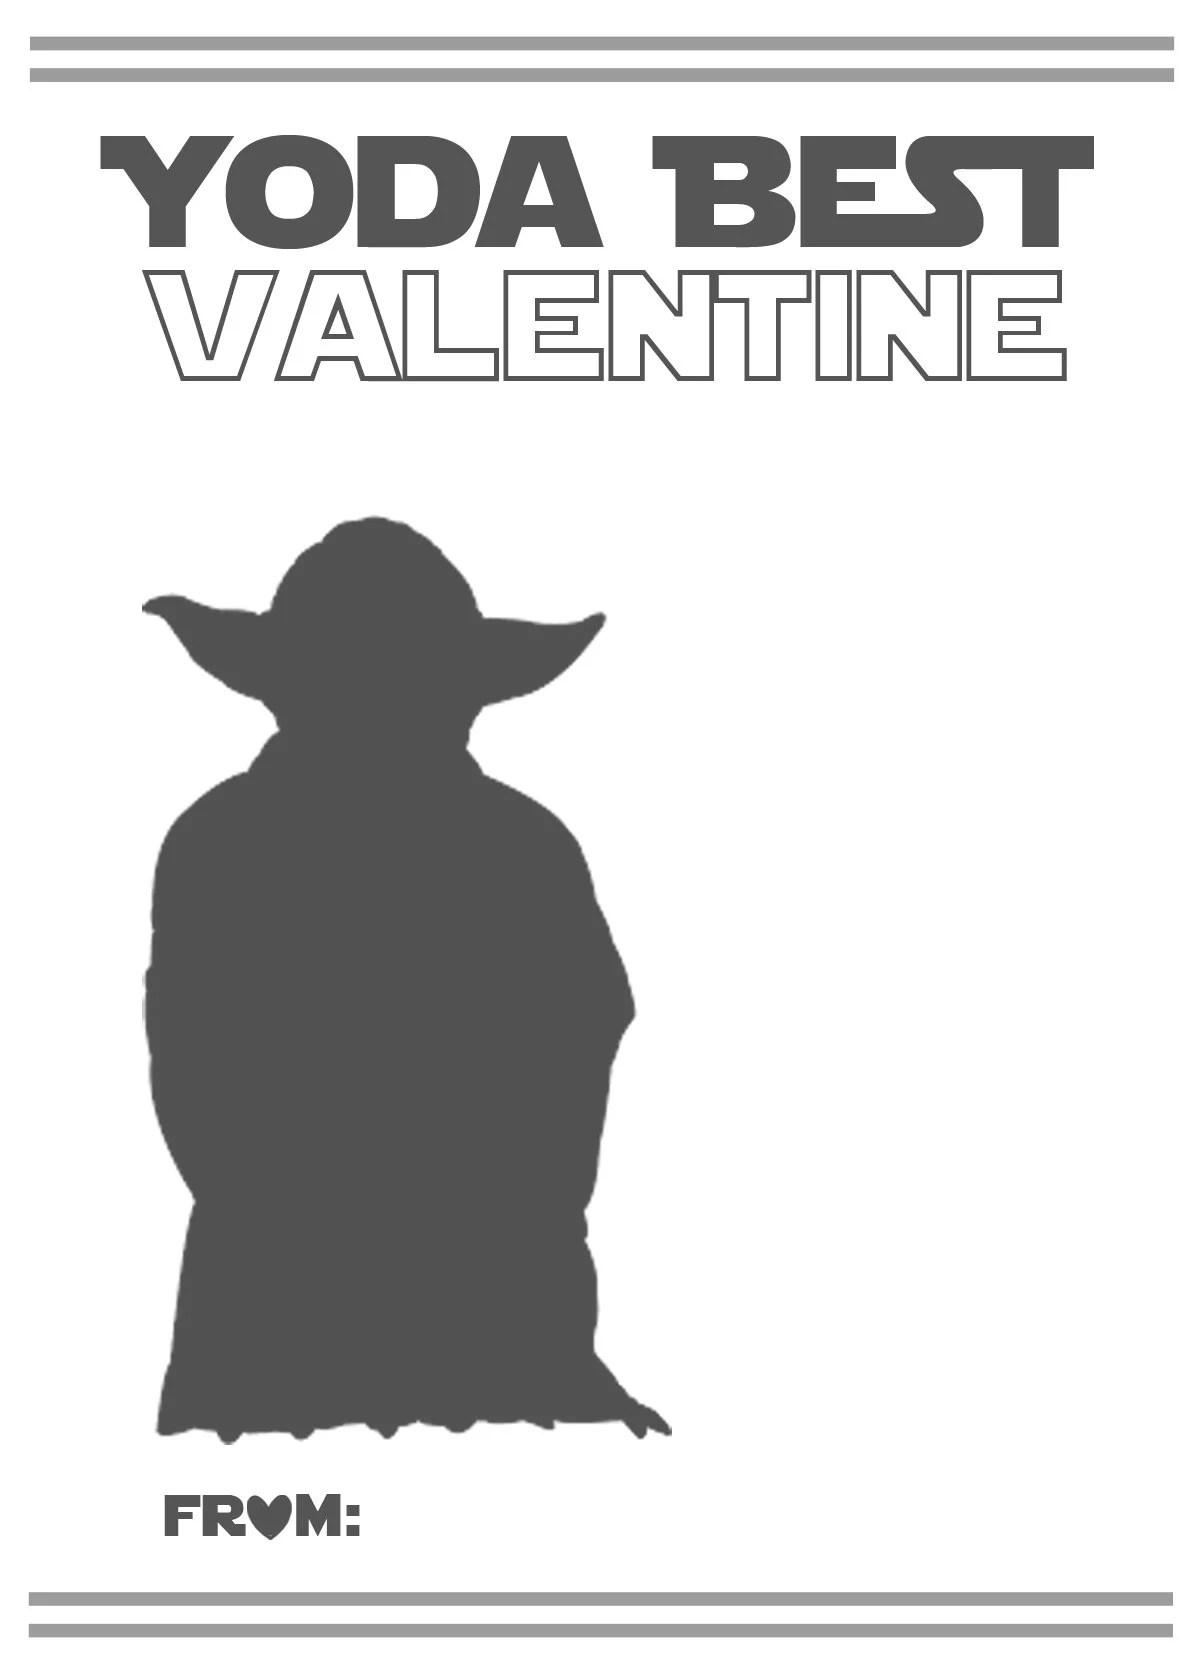 F R E E Valentine Card Printables Star Wars And